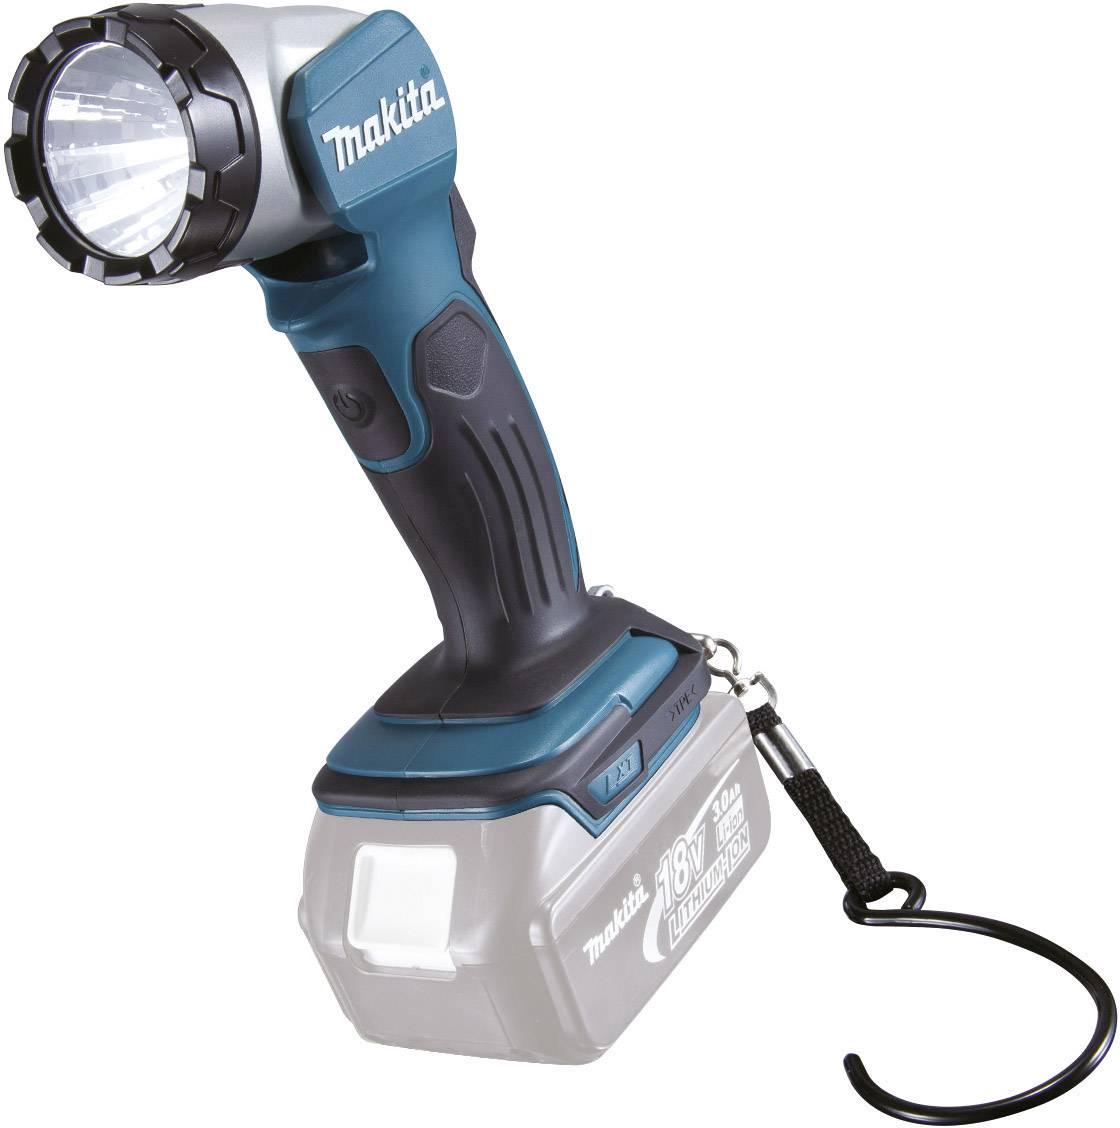 Makita Akku LED Baustrahler Lampe Scheinwerfer DML 805 Original